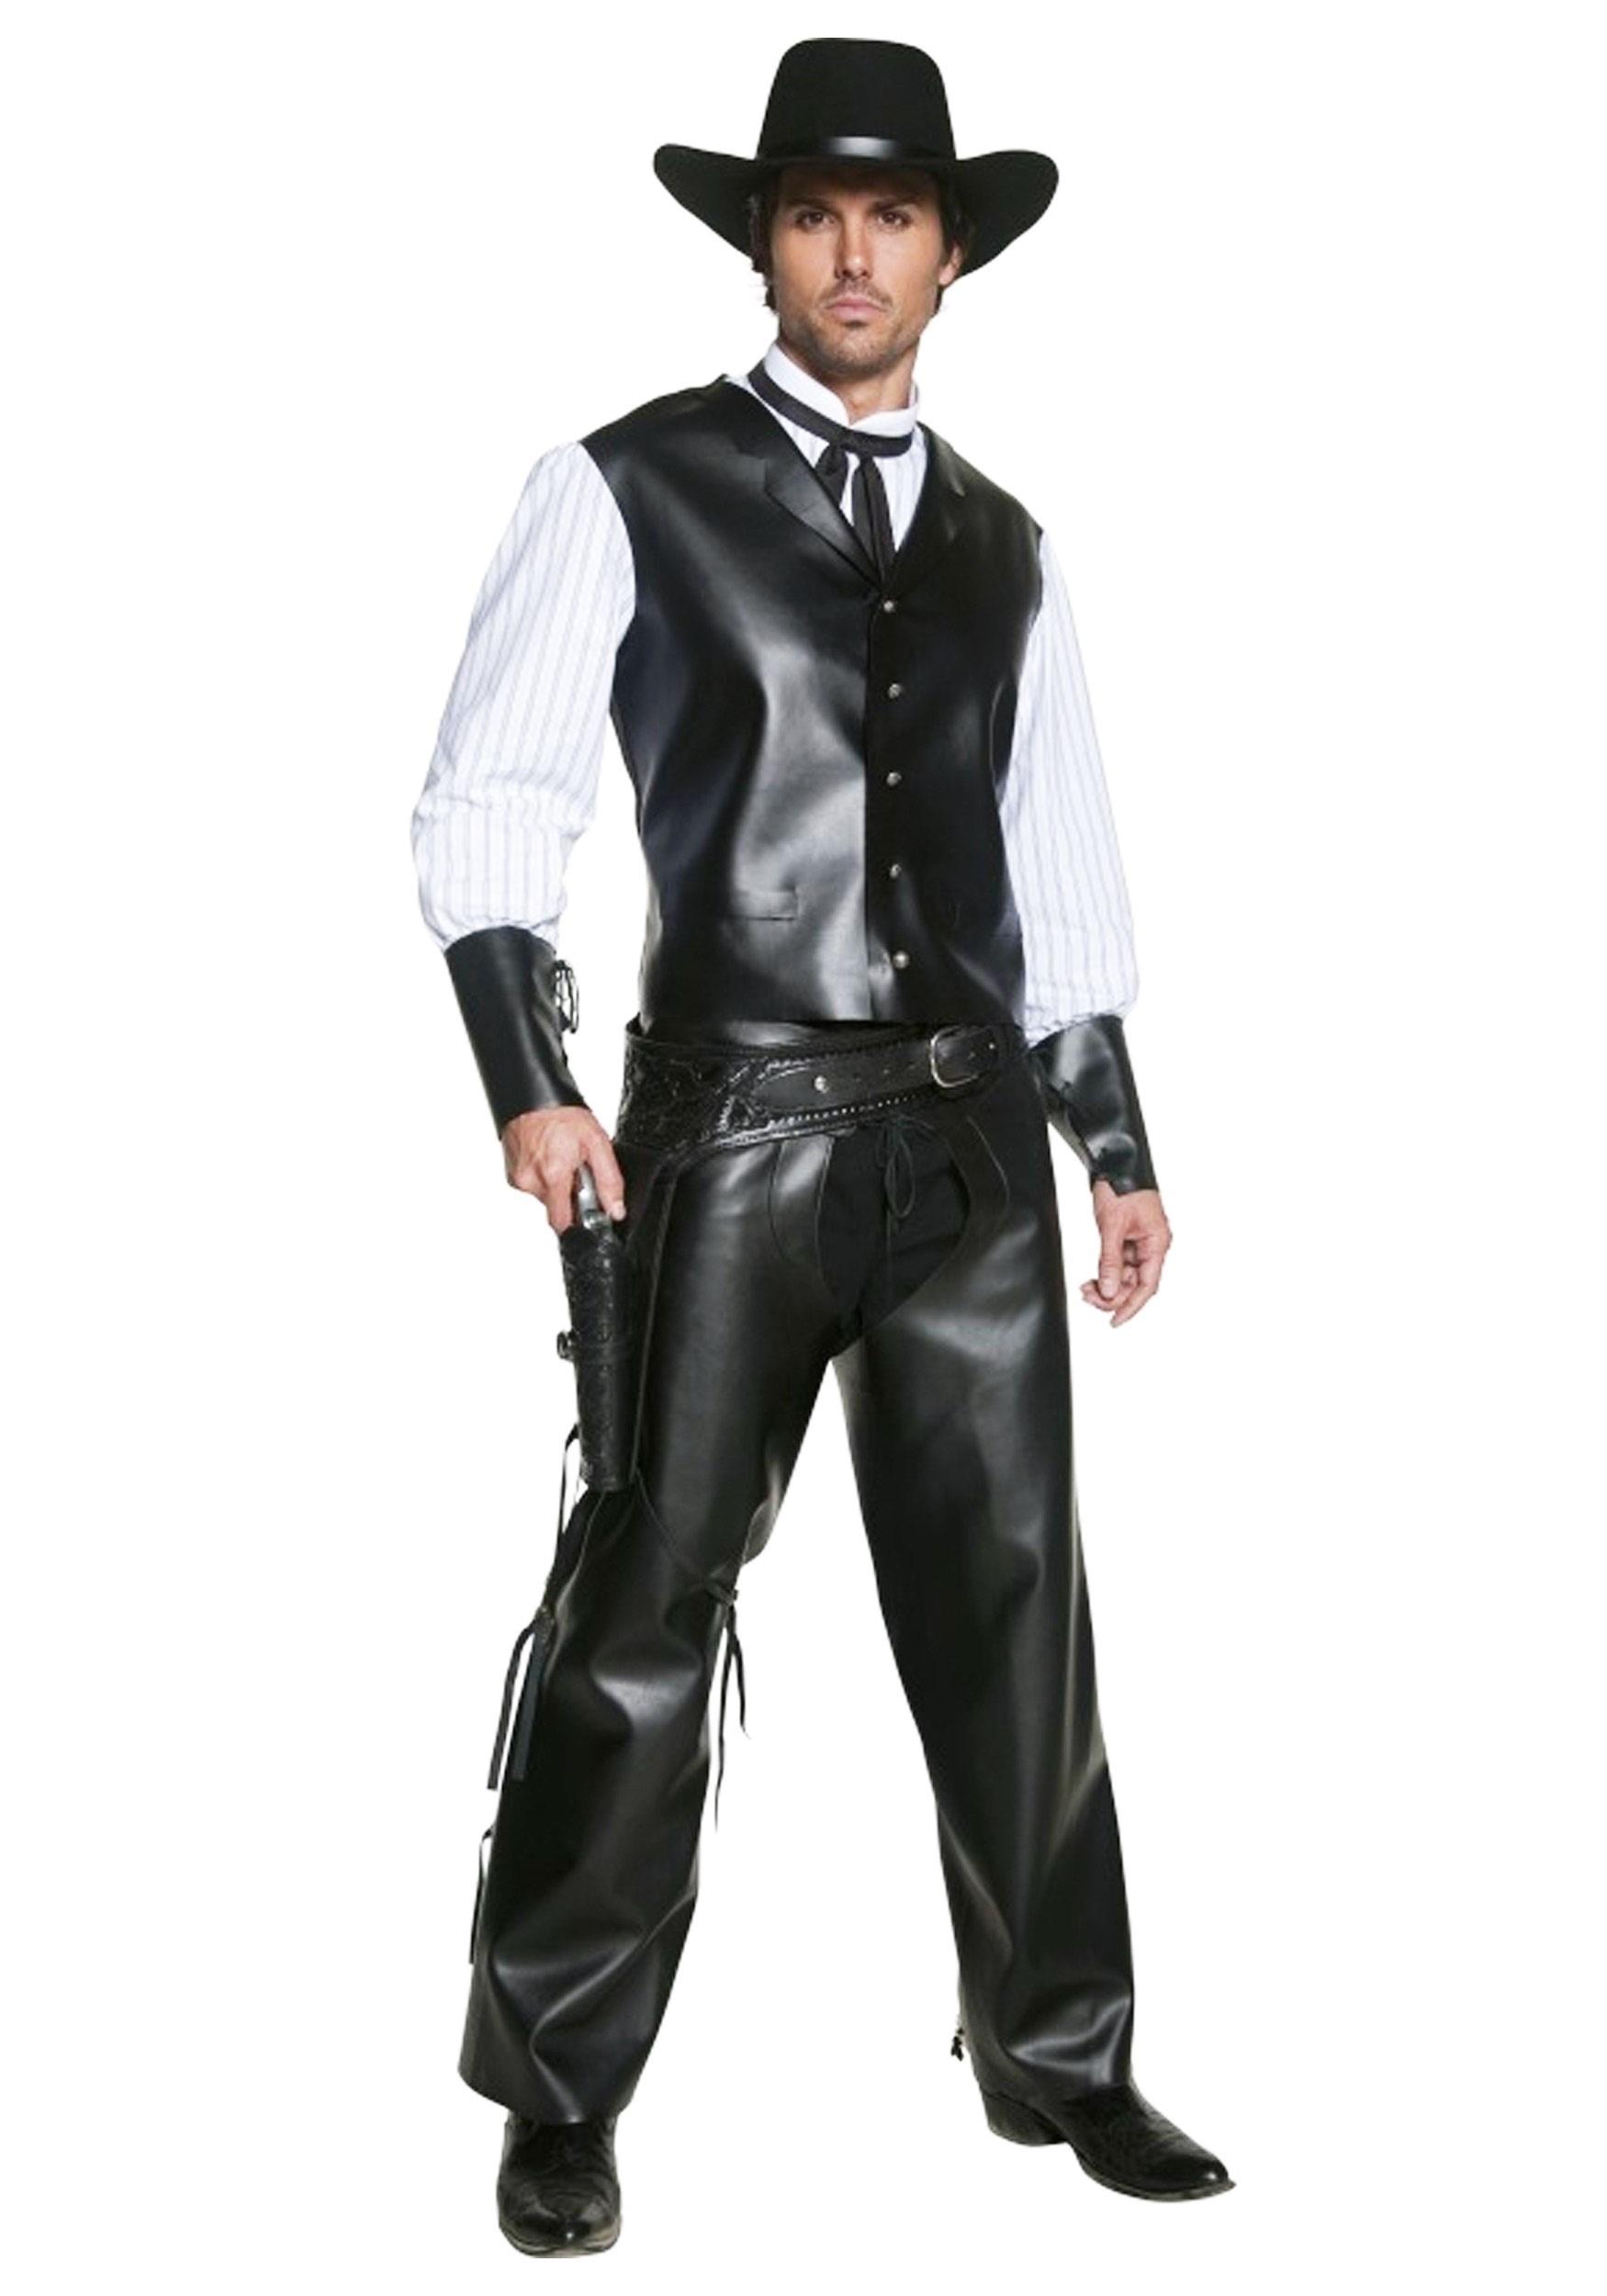 6d0a722d6 Western   Cowboy Costumes - HalloweenCostumes.com